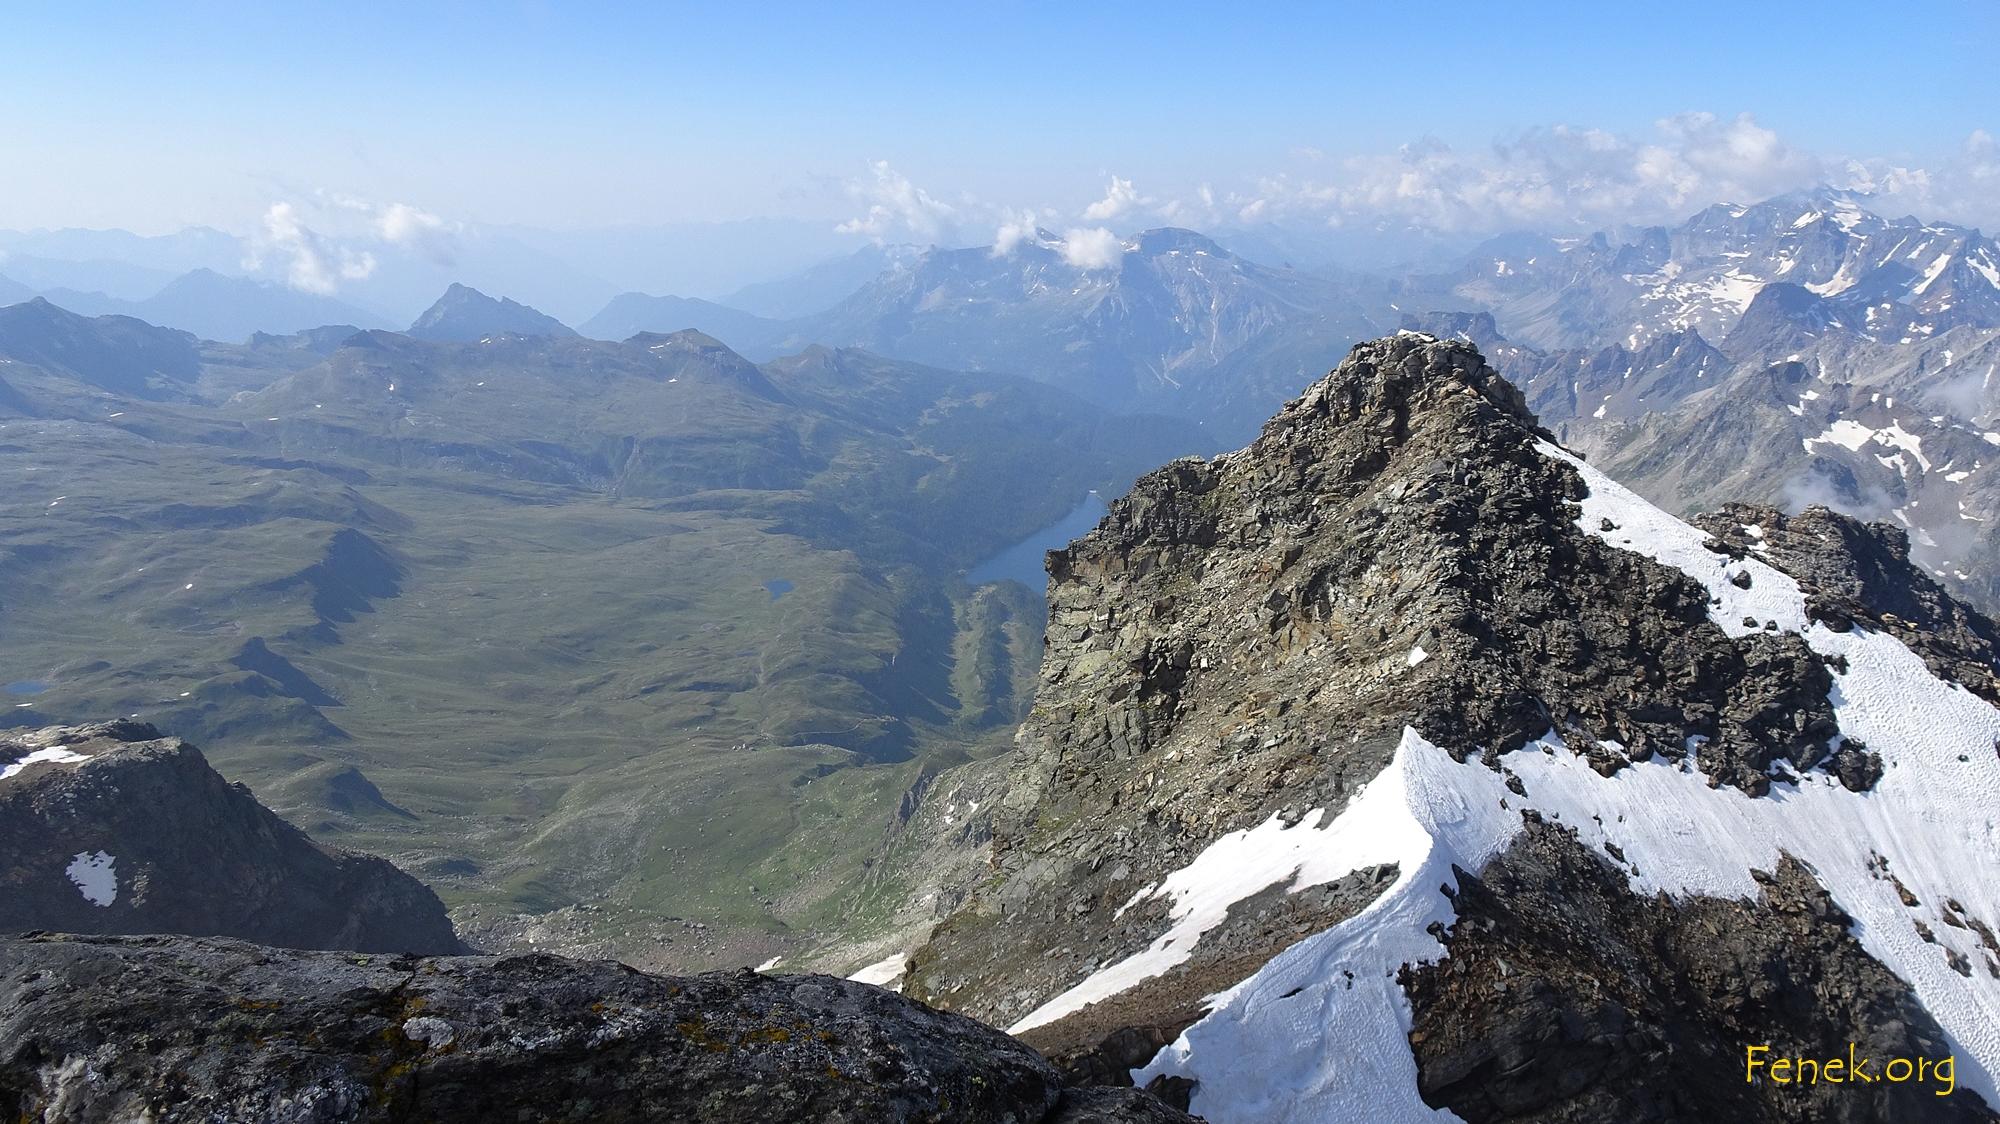 dort unten ist die Devero Alp